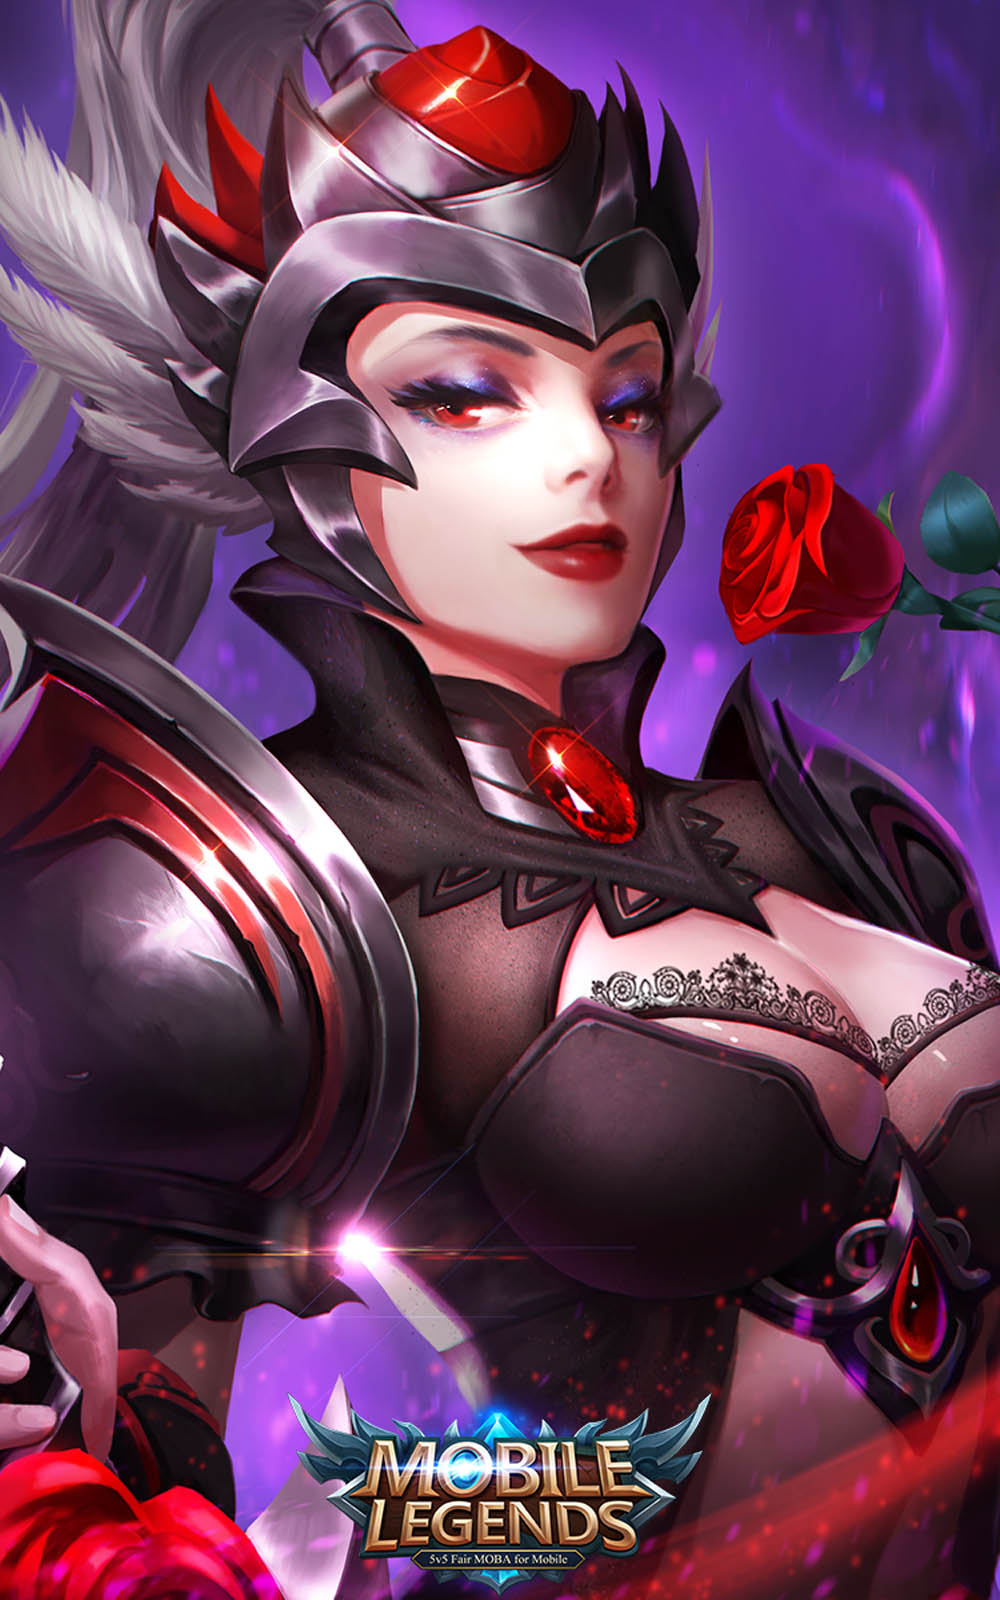 Freya Mobile Legends Hero Download Free Pure HD Quality